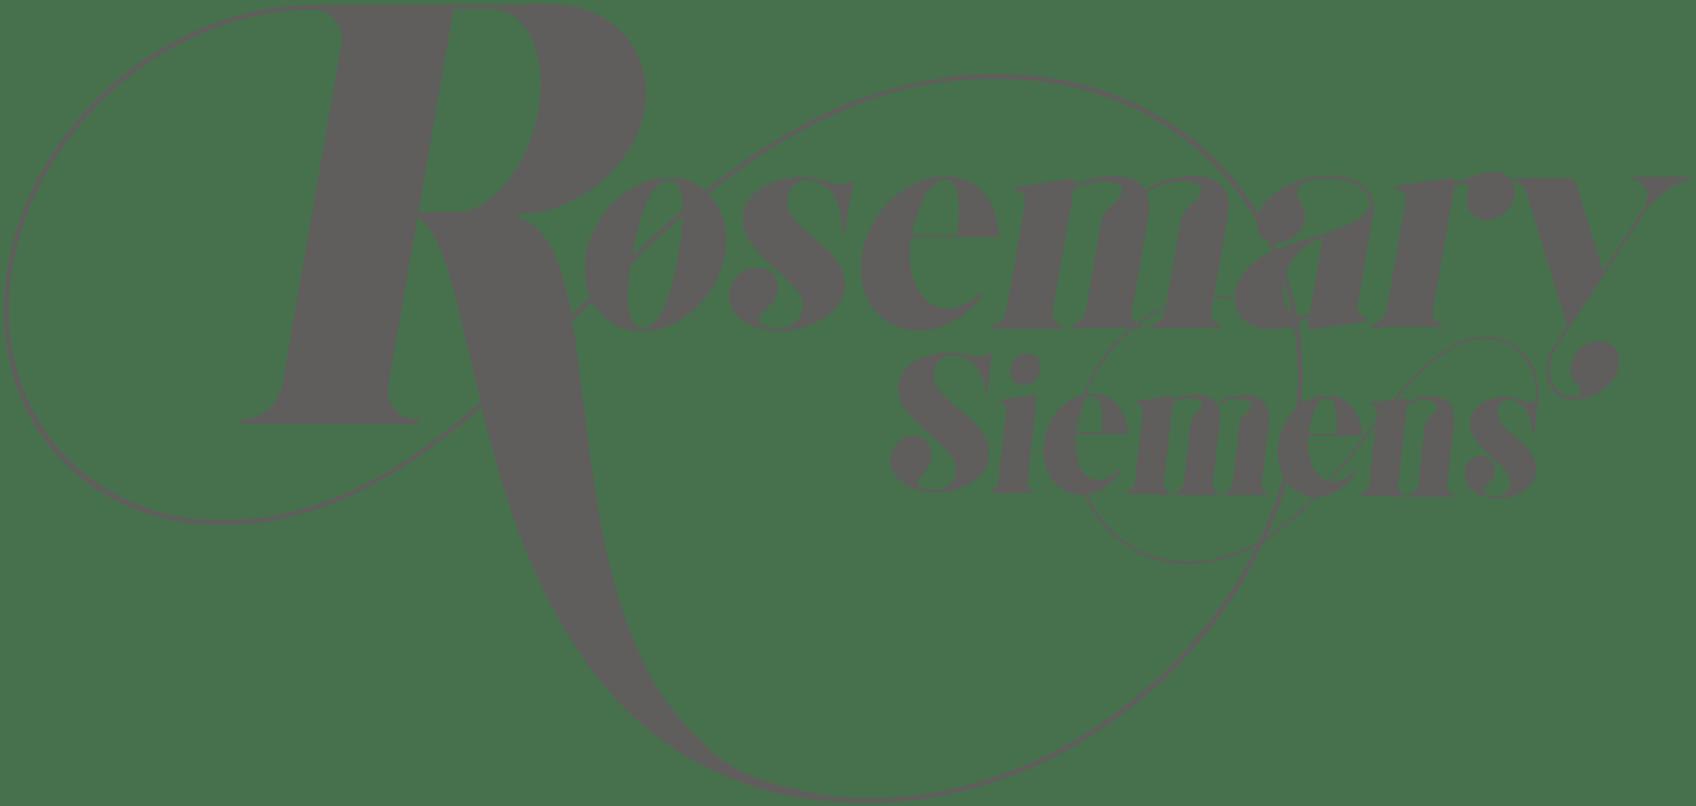 Rosemary-amazing-grace-slider